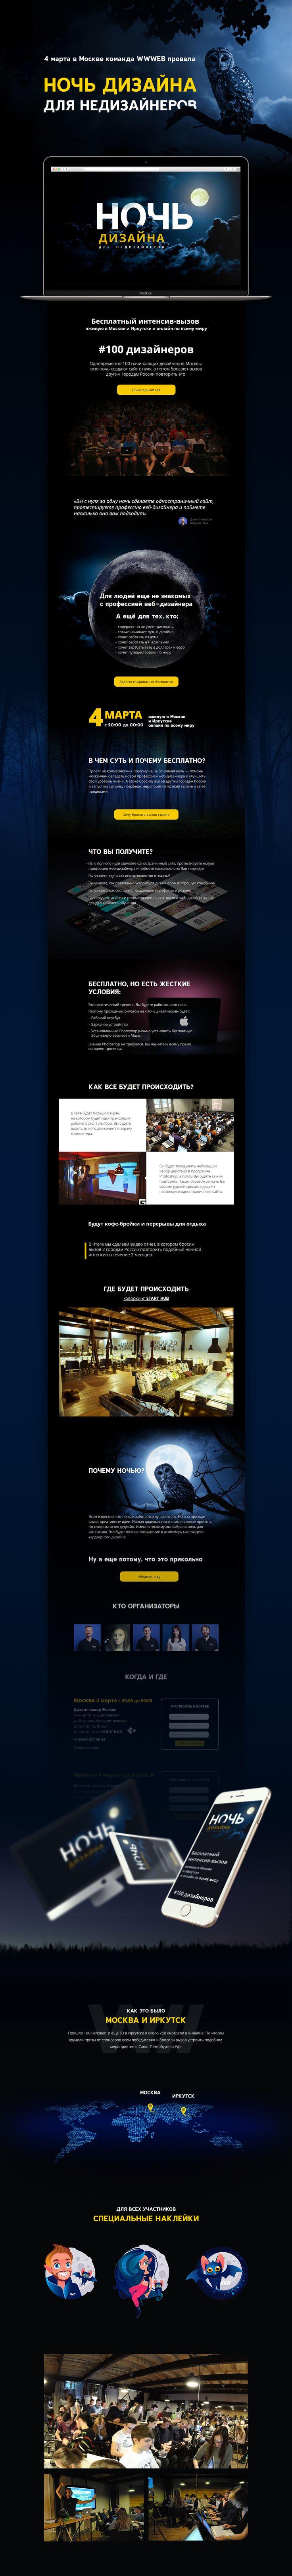 Ночь дизайна / Design night on Behance